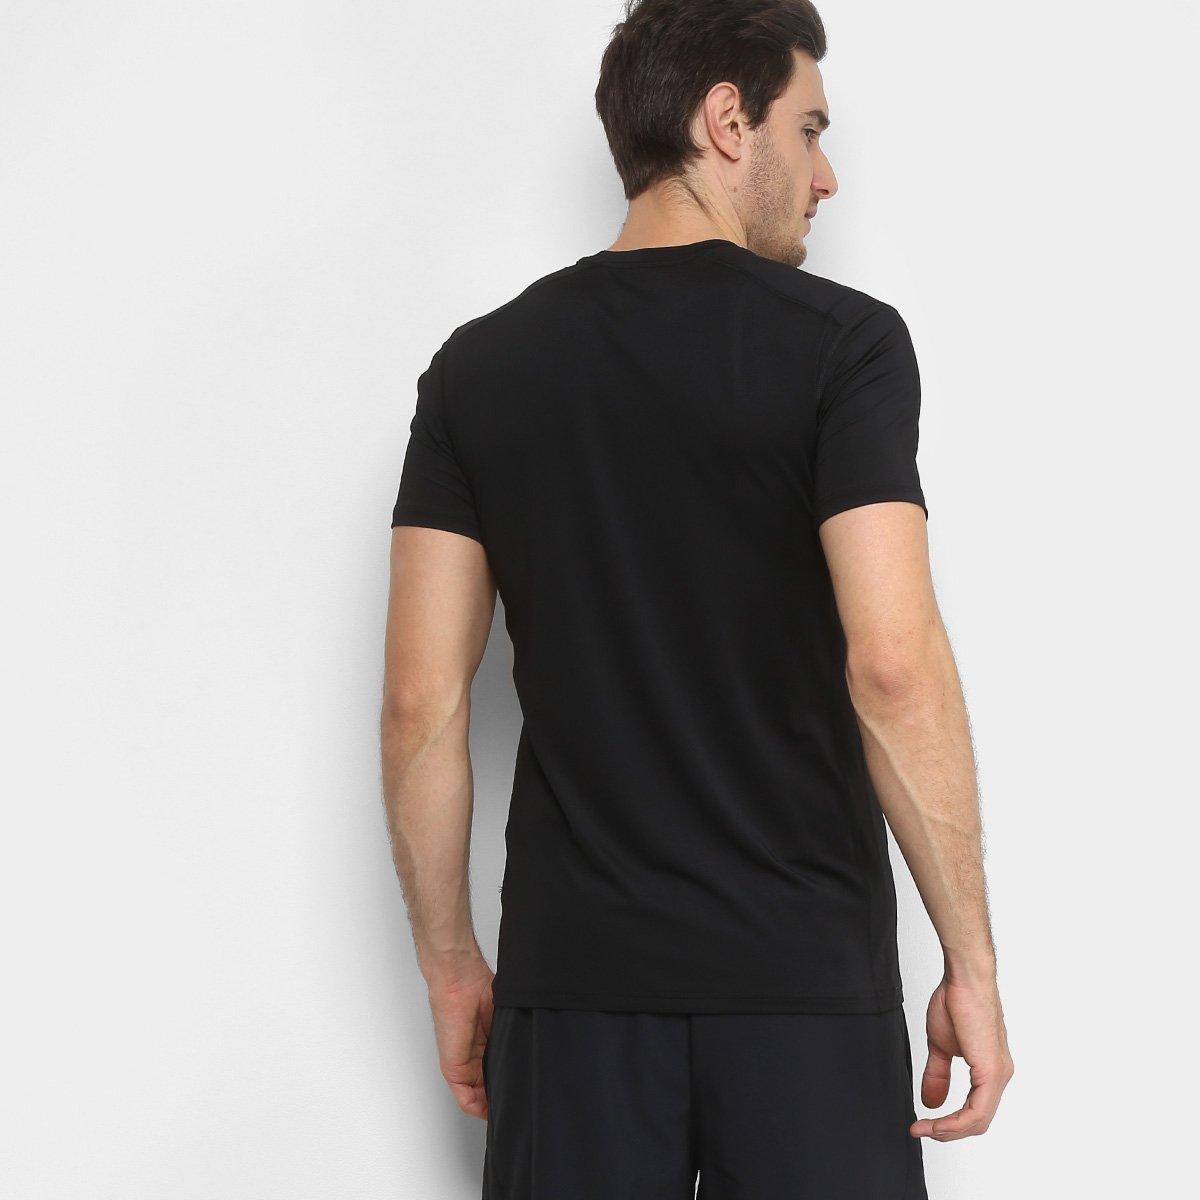 011256b990 Camiseta Nike Bslyr Top Ss 2L Camo Masculina - Preto e Branco ...